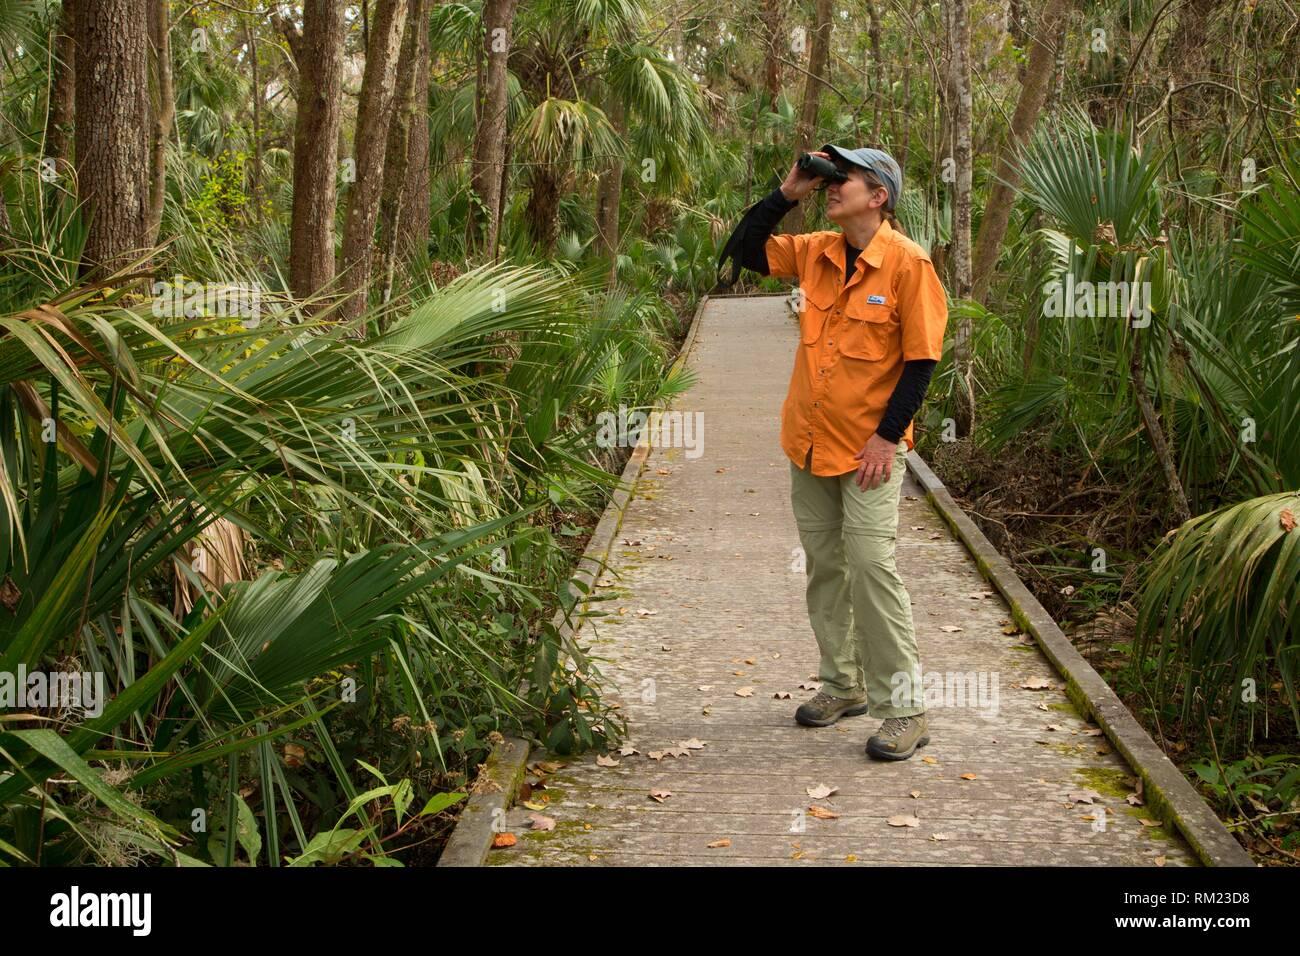 Biodiversity Loop boardwalk, Enchanted Forest Sanctuary, Florida. - Stock Image